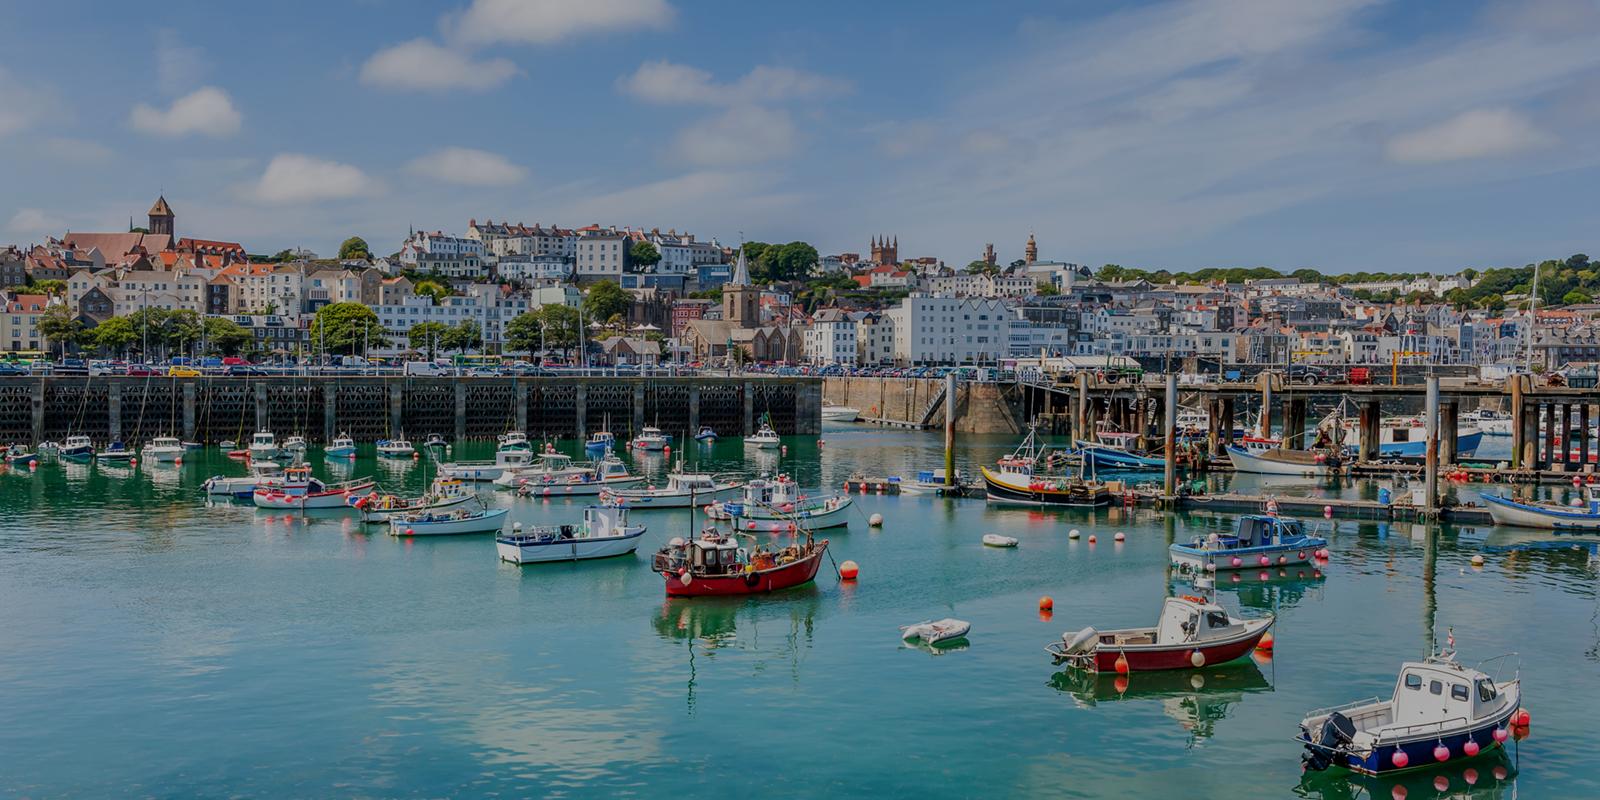 Bailiwick of Guernsey